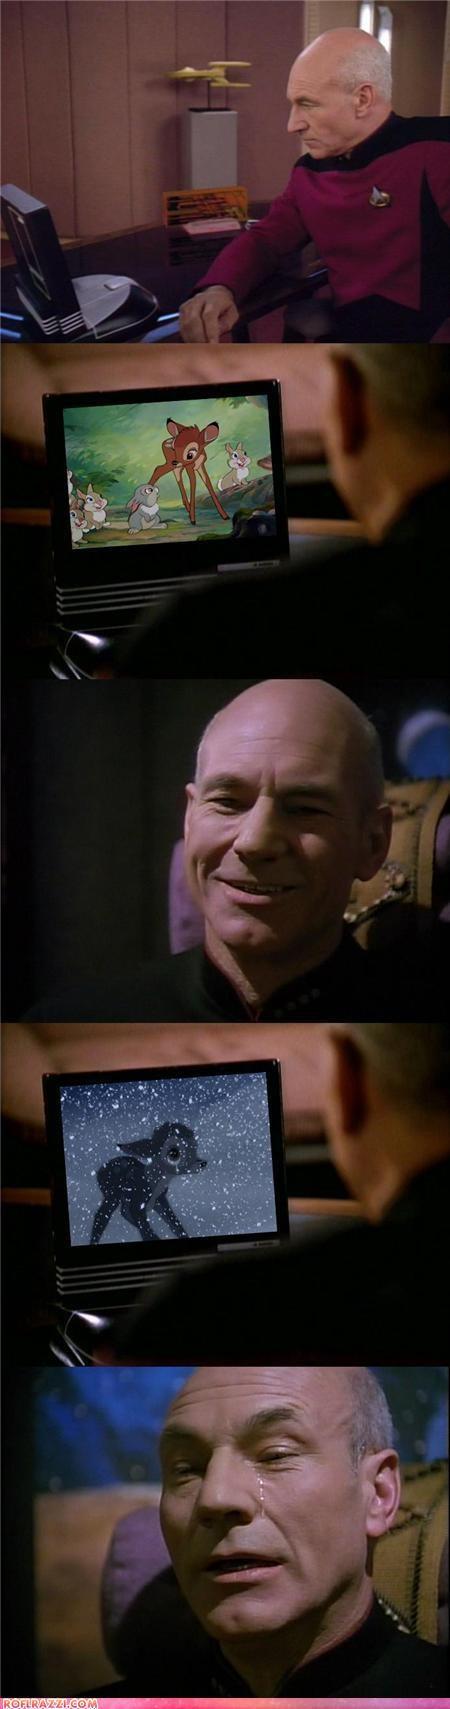 actor celeb comic funny patrick stewart sci fi Star Trek TV - 5248431872